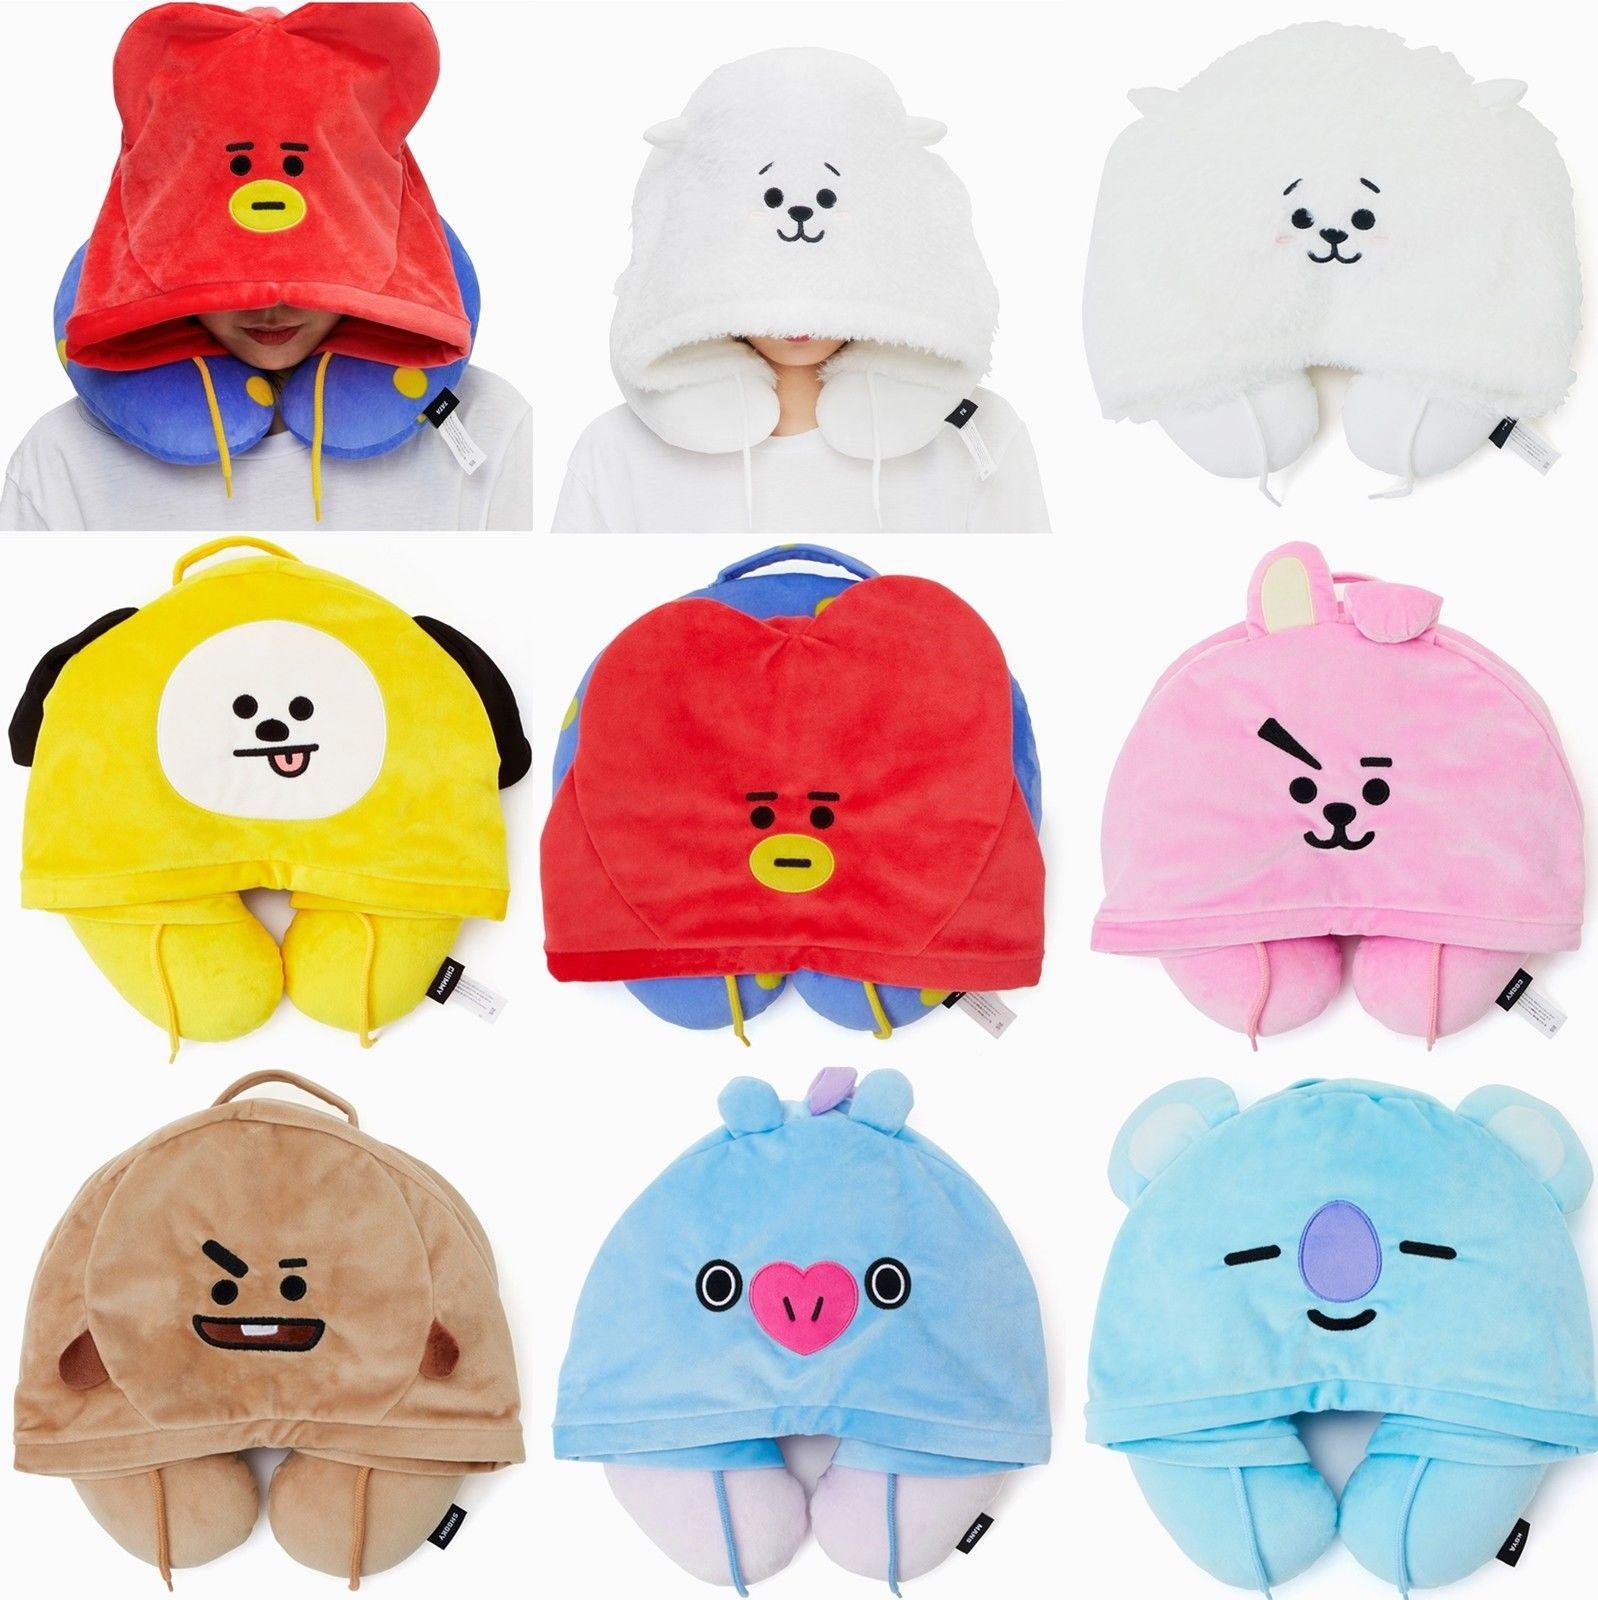 Kpop BTS BT21 CHIMMY TATA COOKY MANG RJ KOYA SHOOKY Spielzeug Mit Kapuze U-shaped Plüsch Neck Kissen Kissen Hut für Schlaf Hause Textil